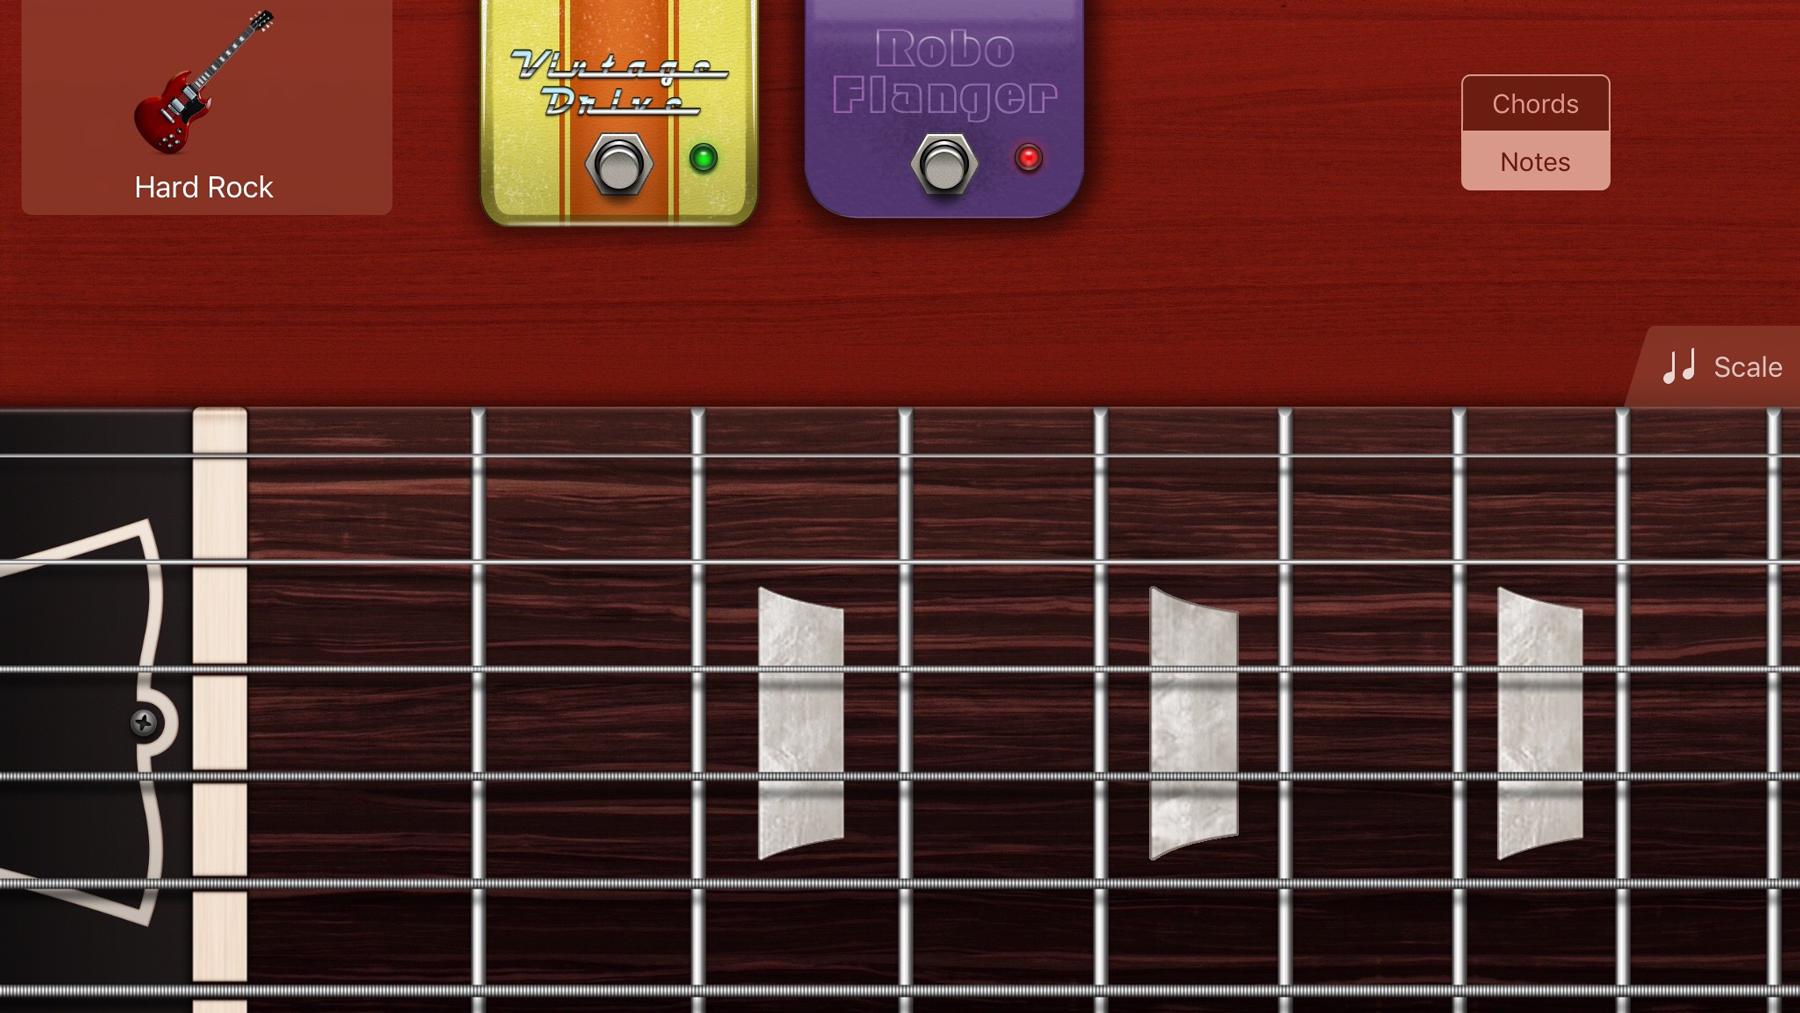 How to Use GarageBand on iPhone and iPad: Guitars